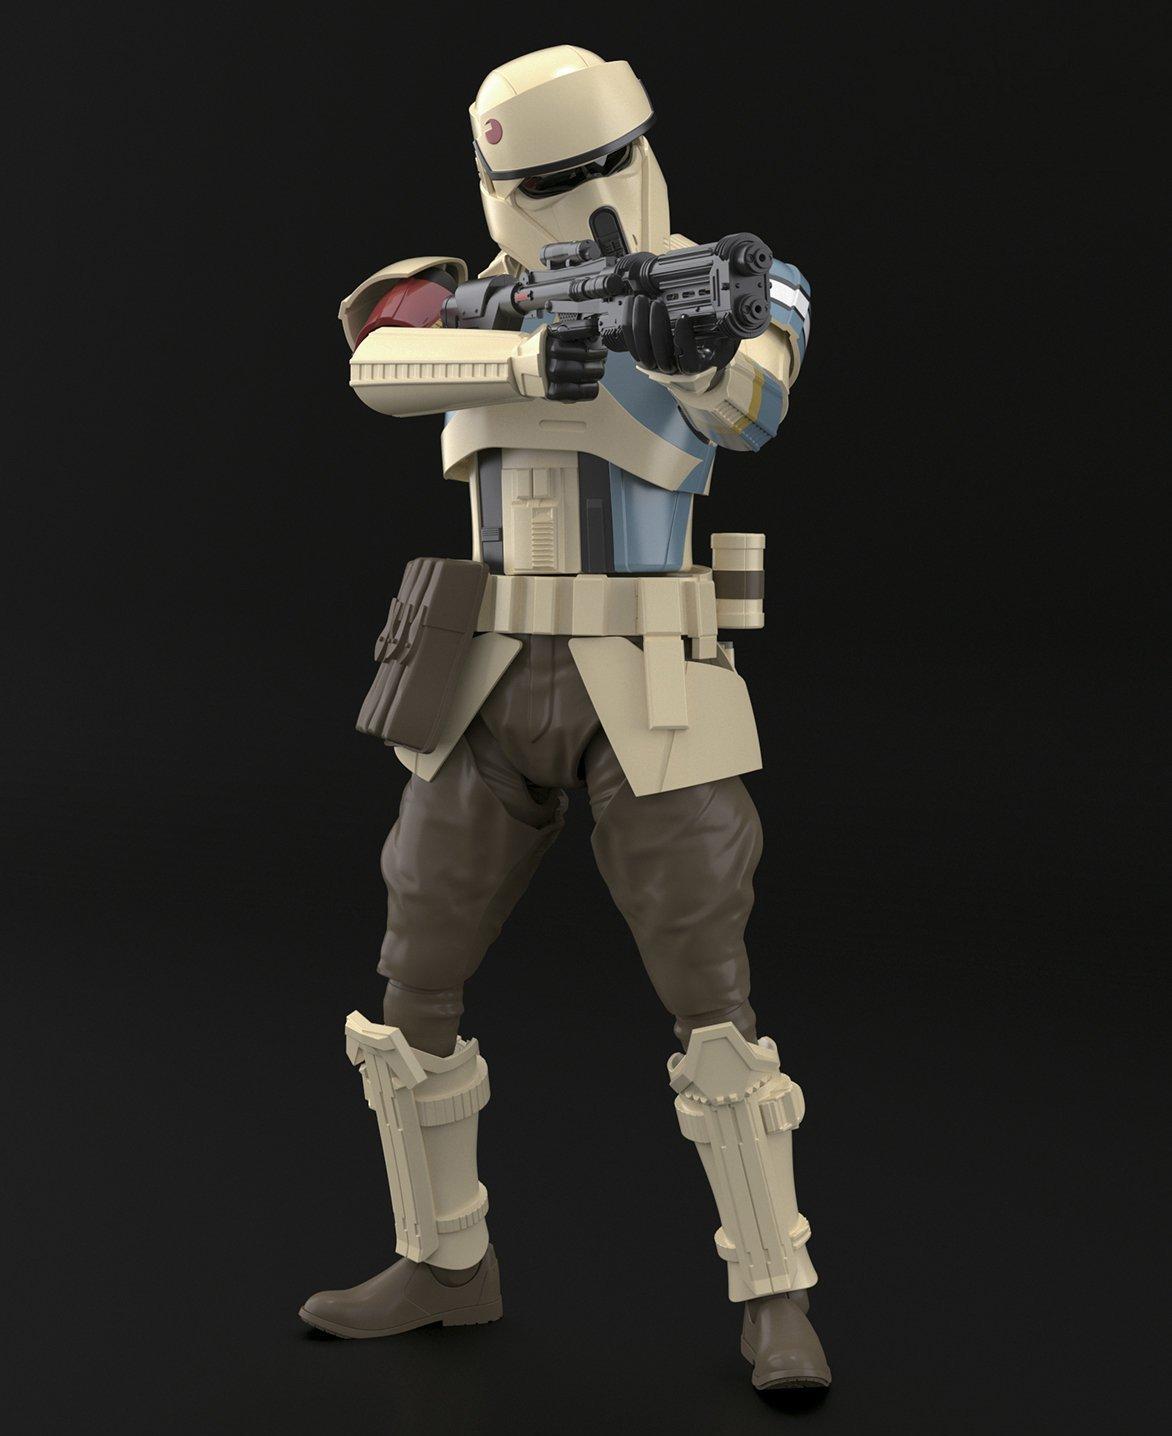 Star Wars 1/12 Shoretrooper - Scale Model Kit image